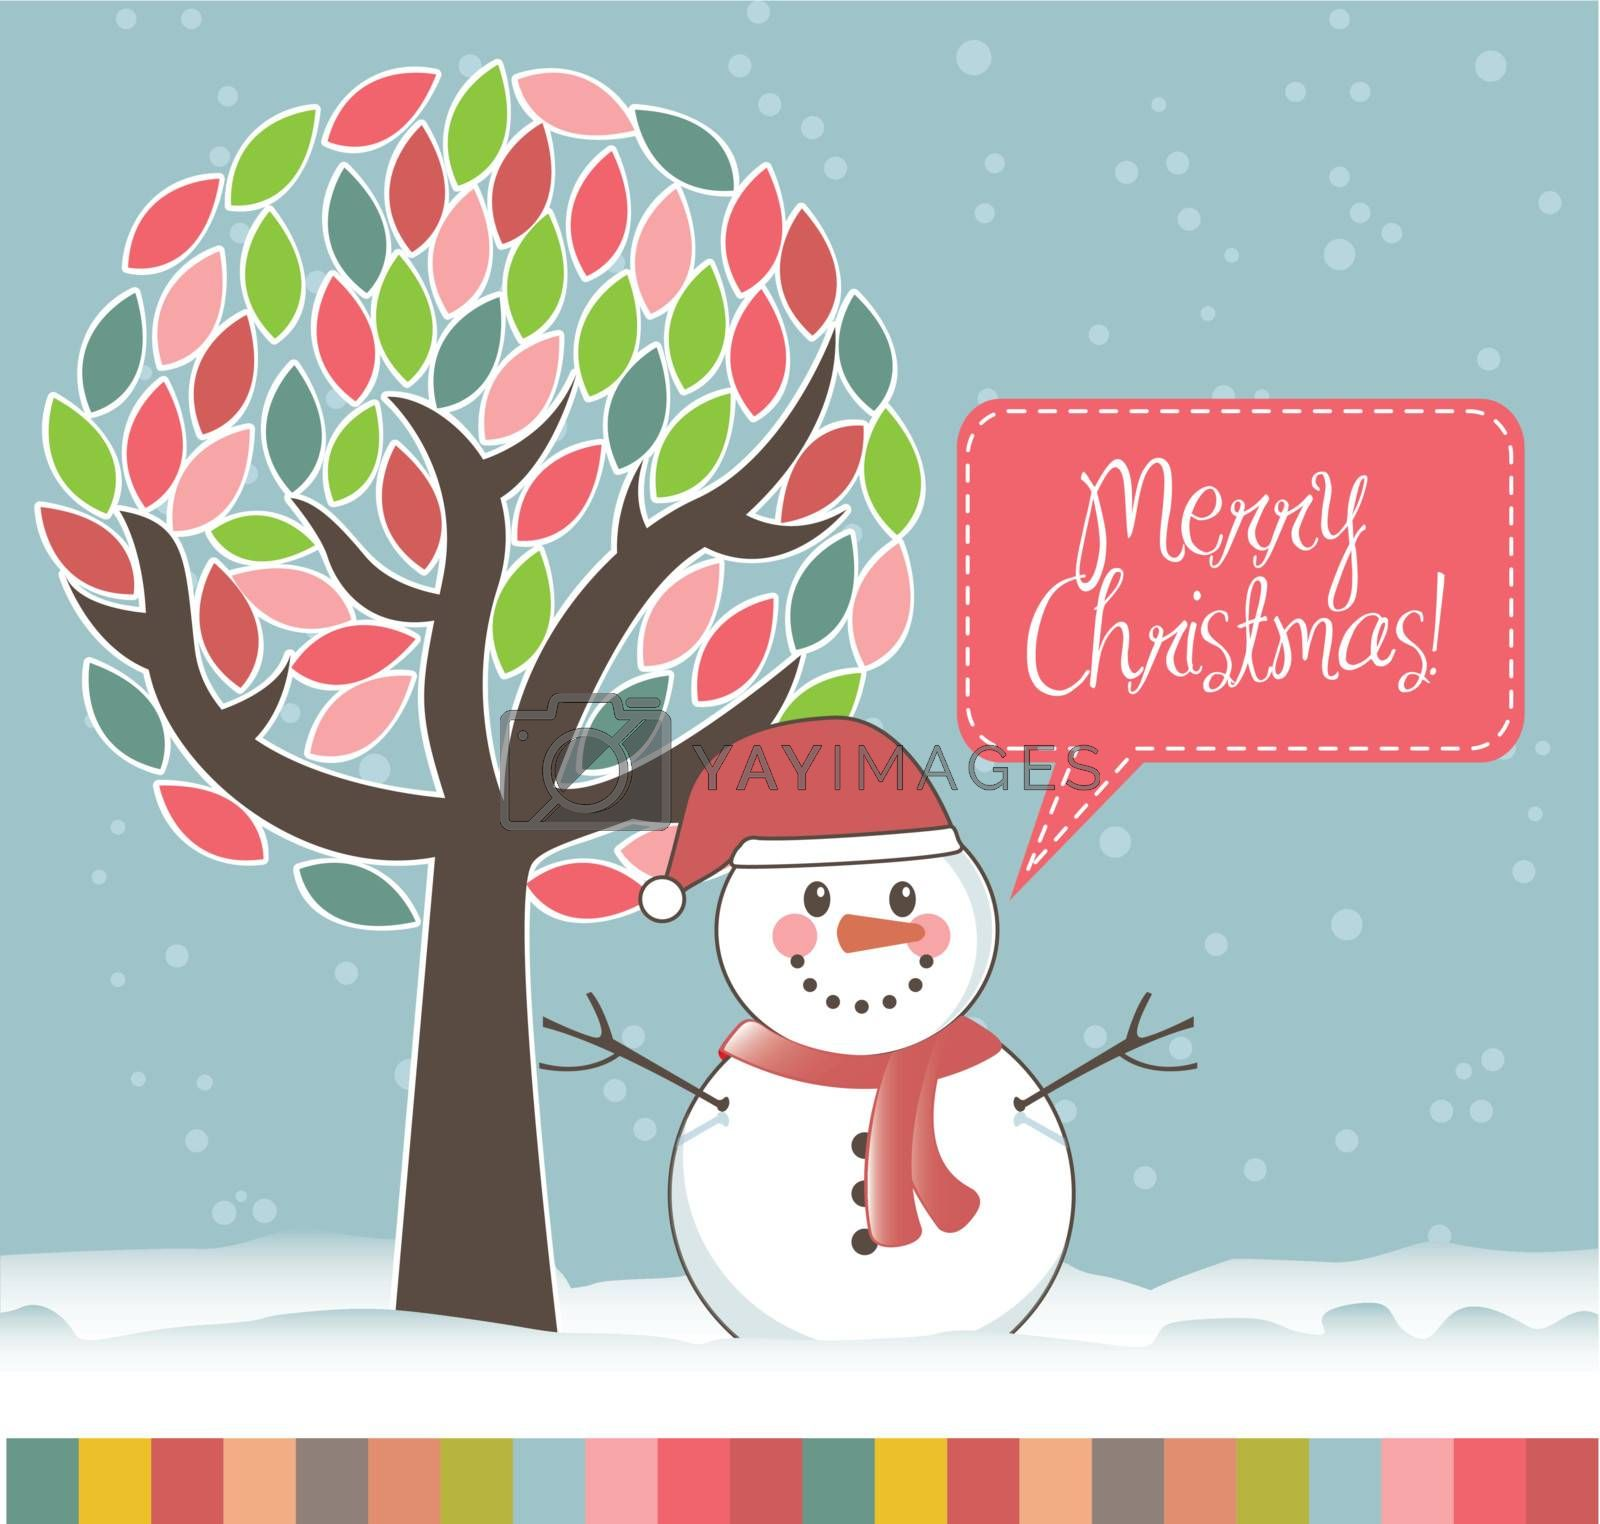 christmas card with snowan and tree. vector illustration